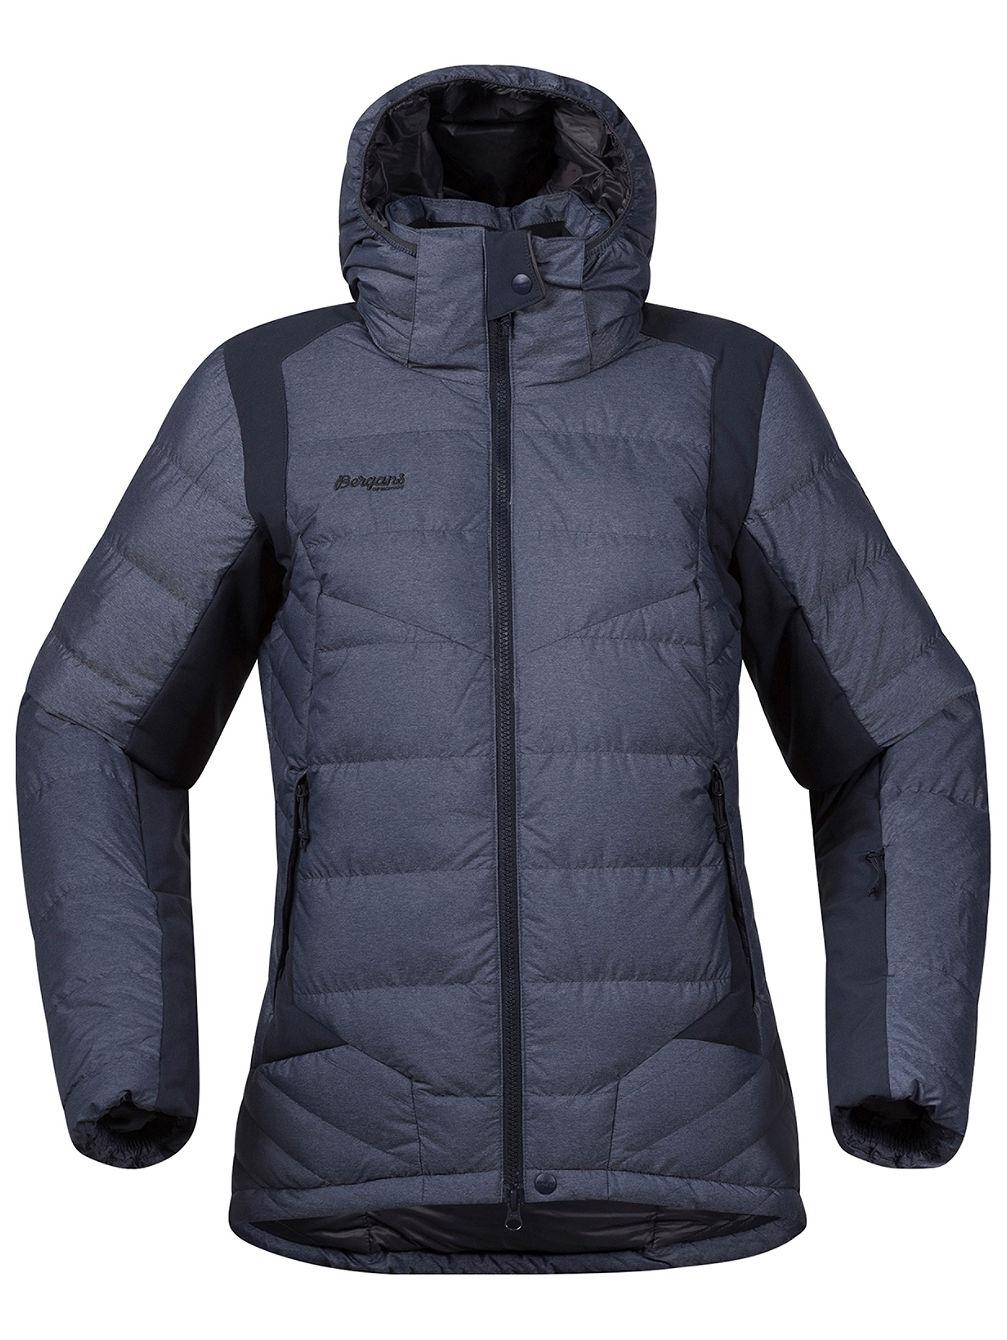 8ee9c6aedc8 Buy Bergans Rjukan Down Jacket online at Blue Tomato